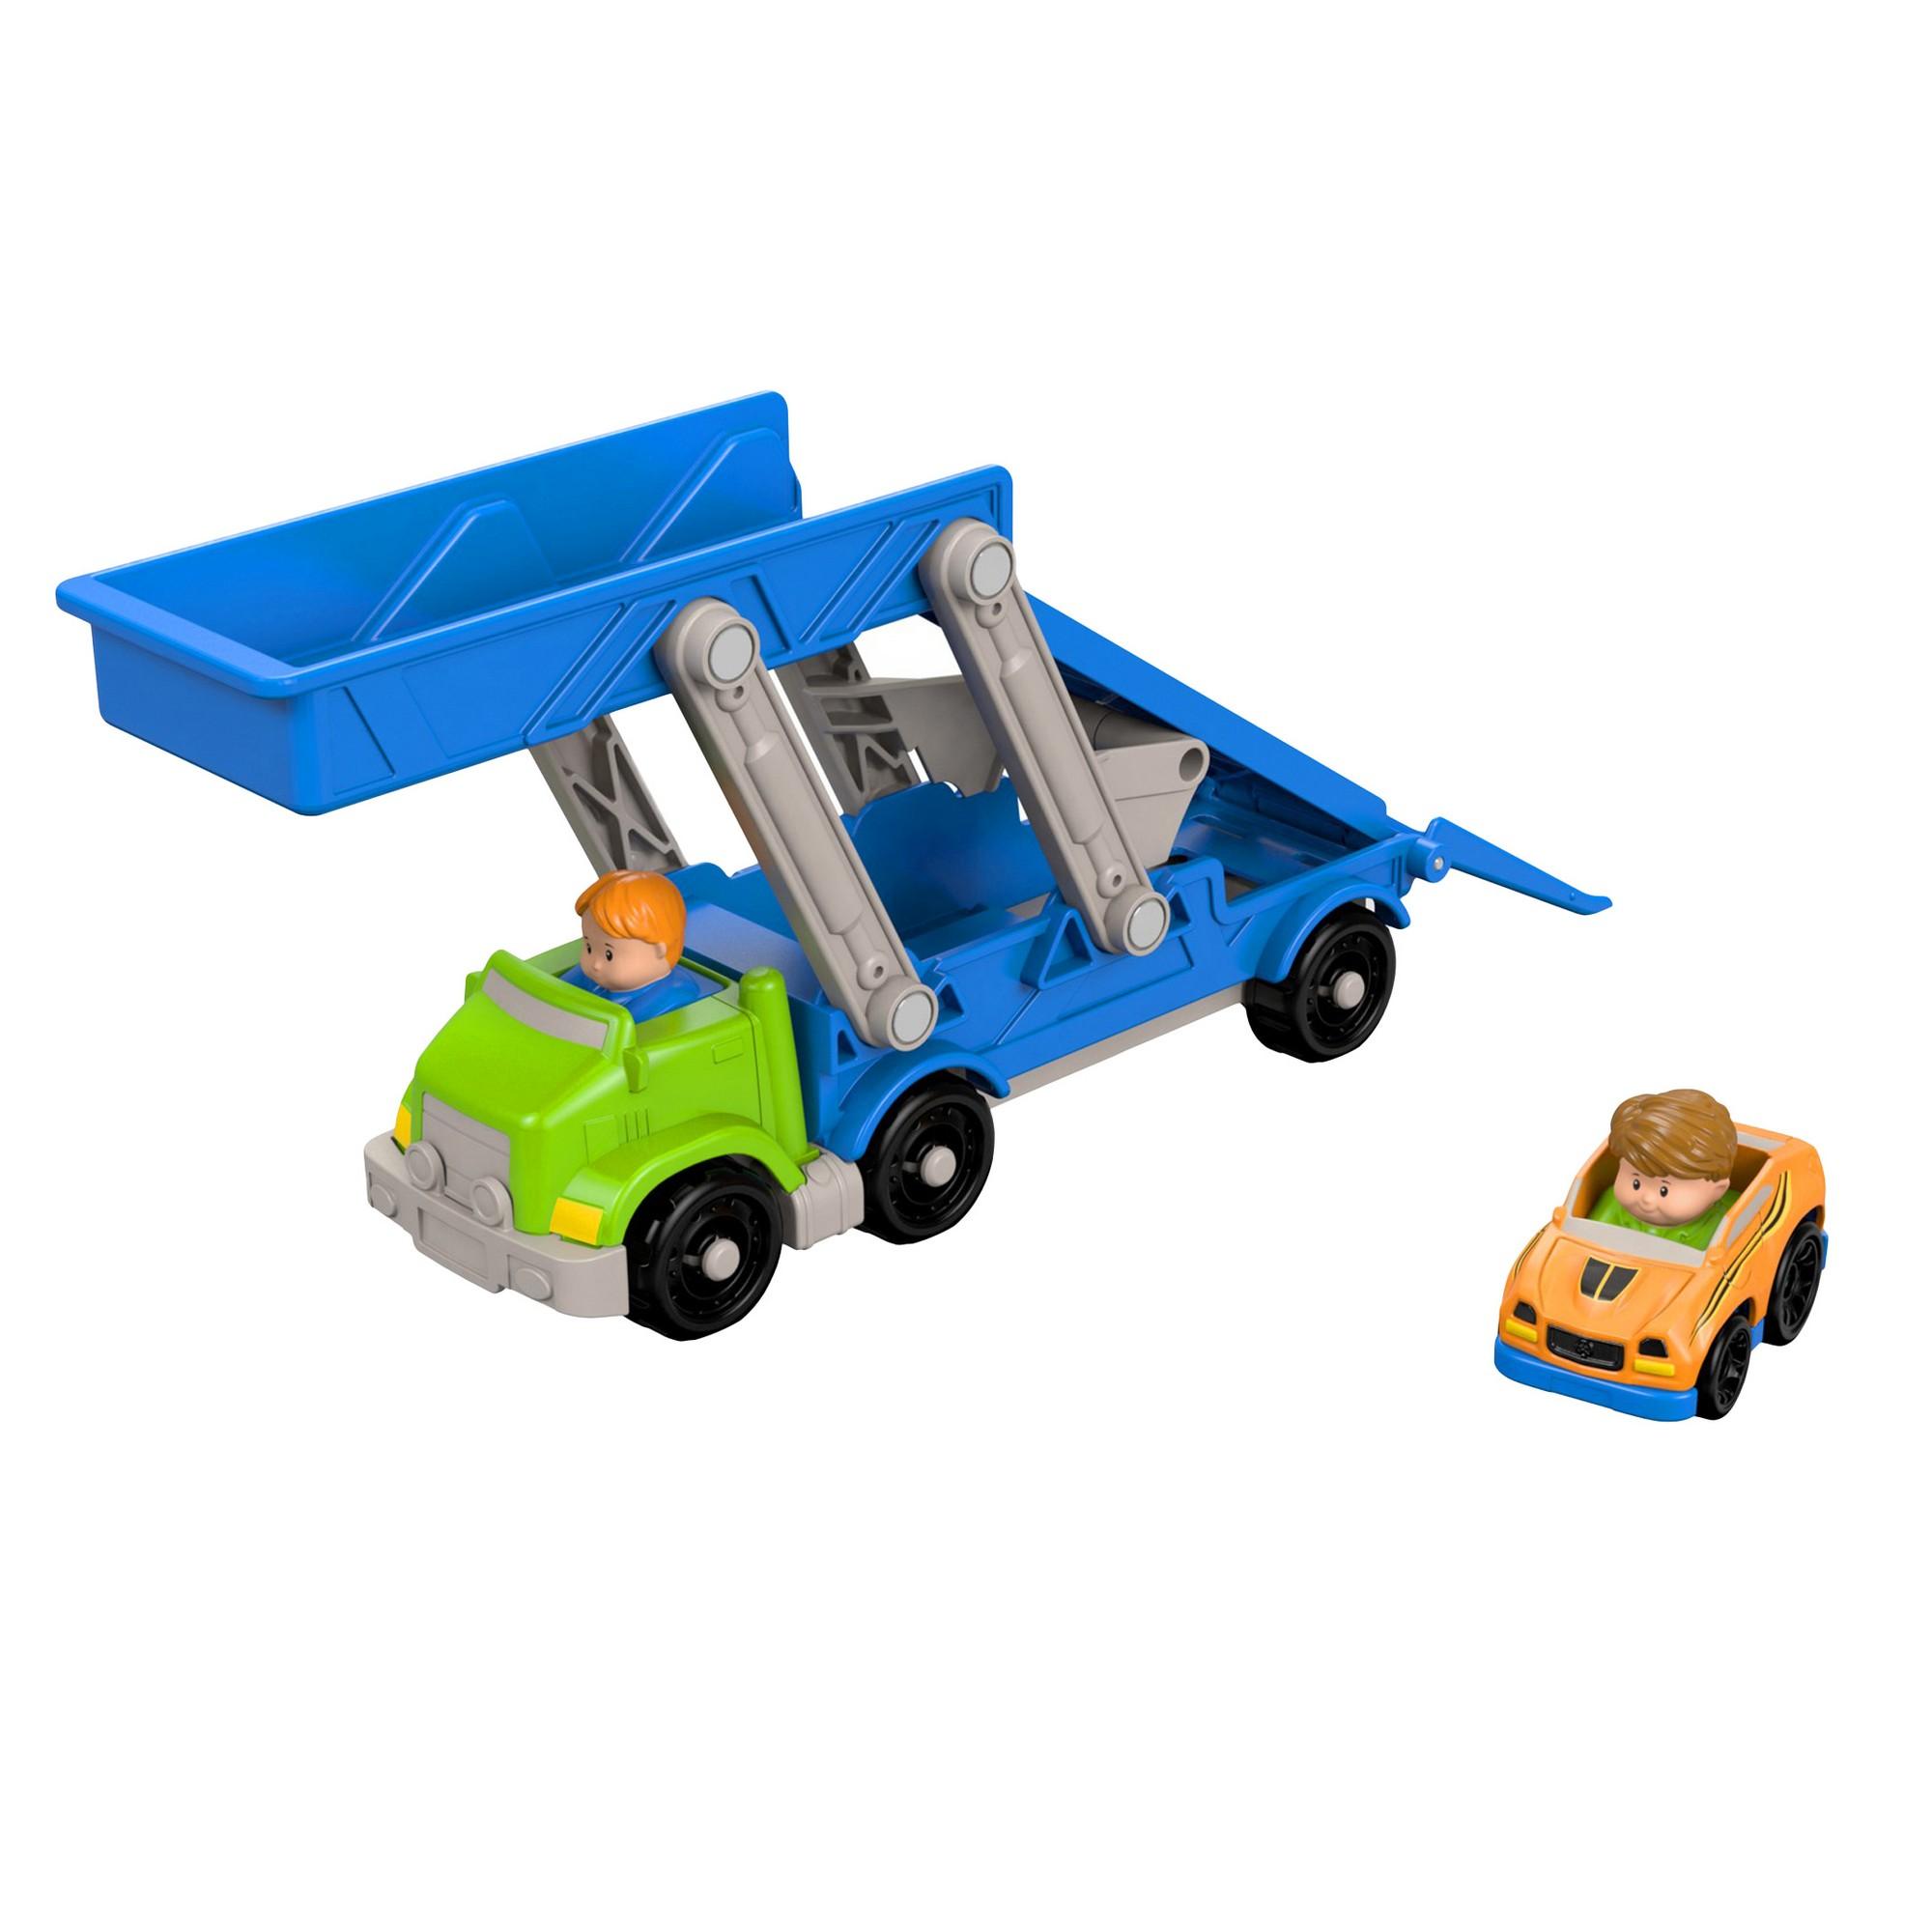 Little people car toys  FisherPrice Little People Ramp un Go Carrier  Products  Pinterest